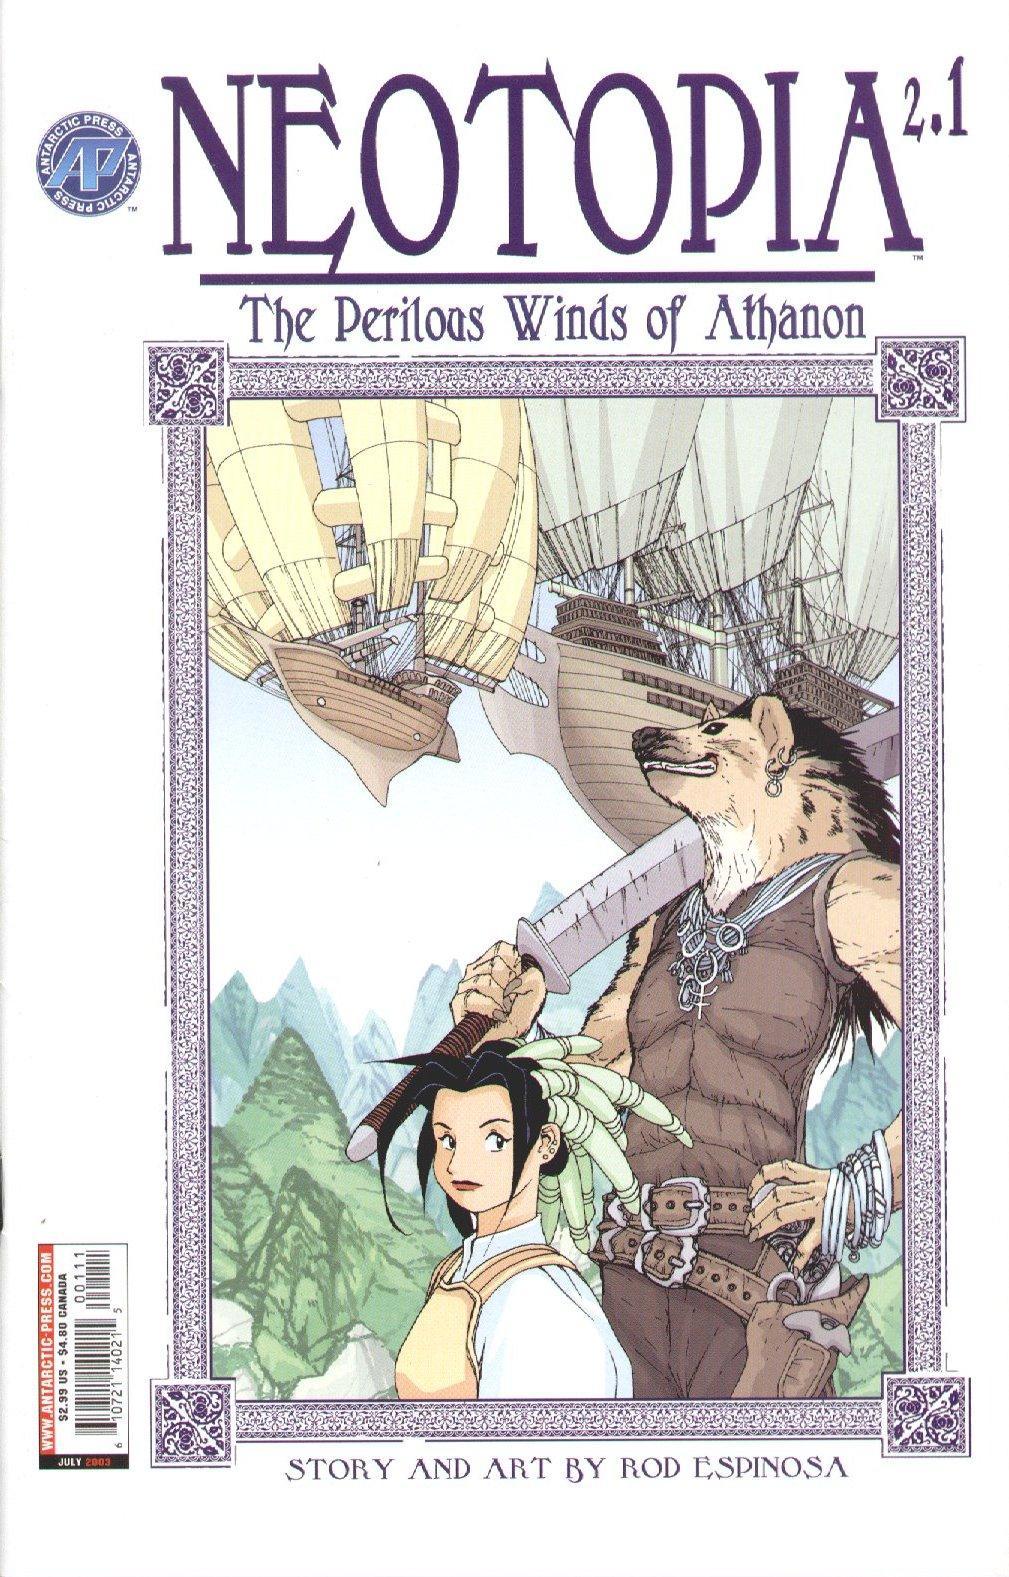 Neotopia v2-The Perilous Winds of Athanon 001-005 2003 Neotopia v2 01 2003 ed=c2c